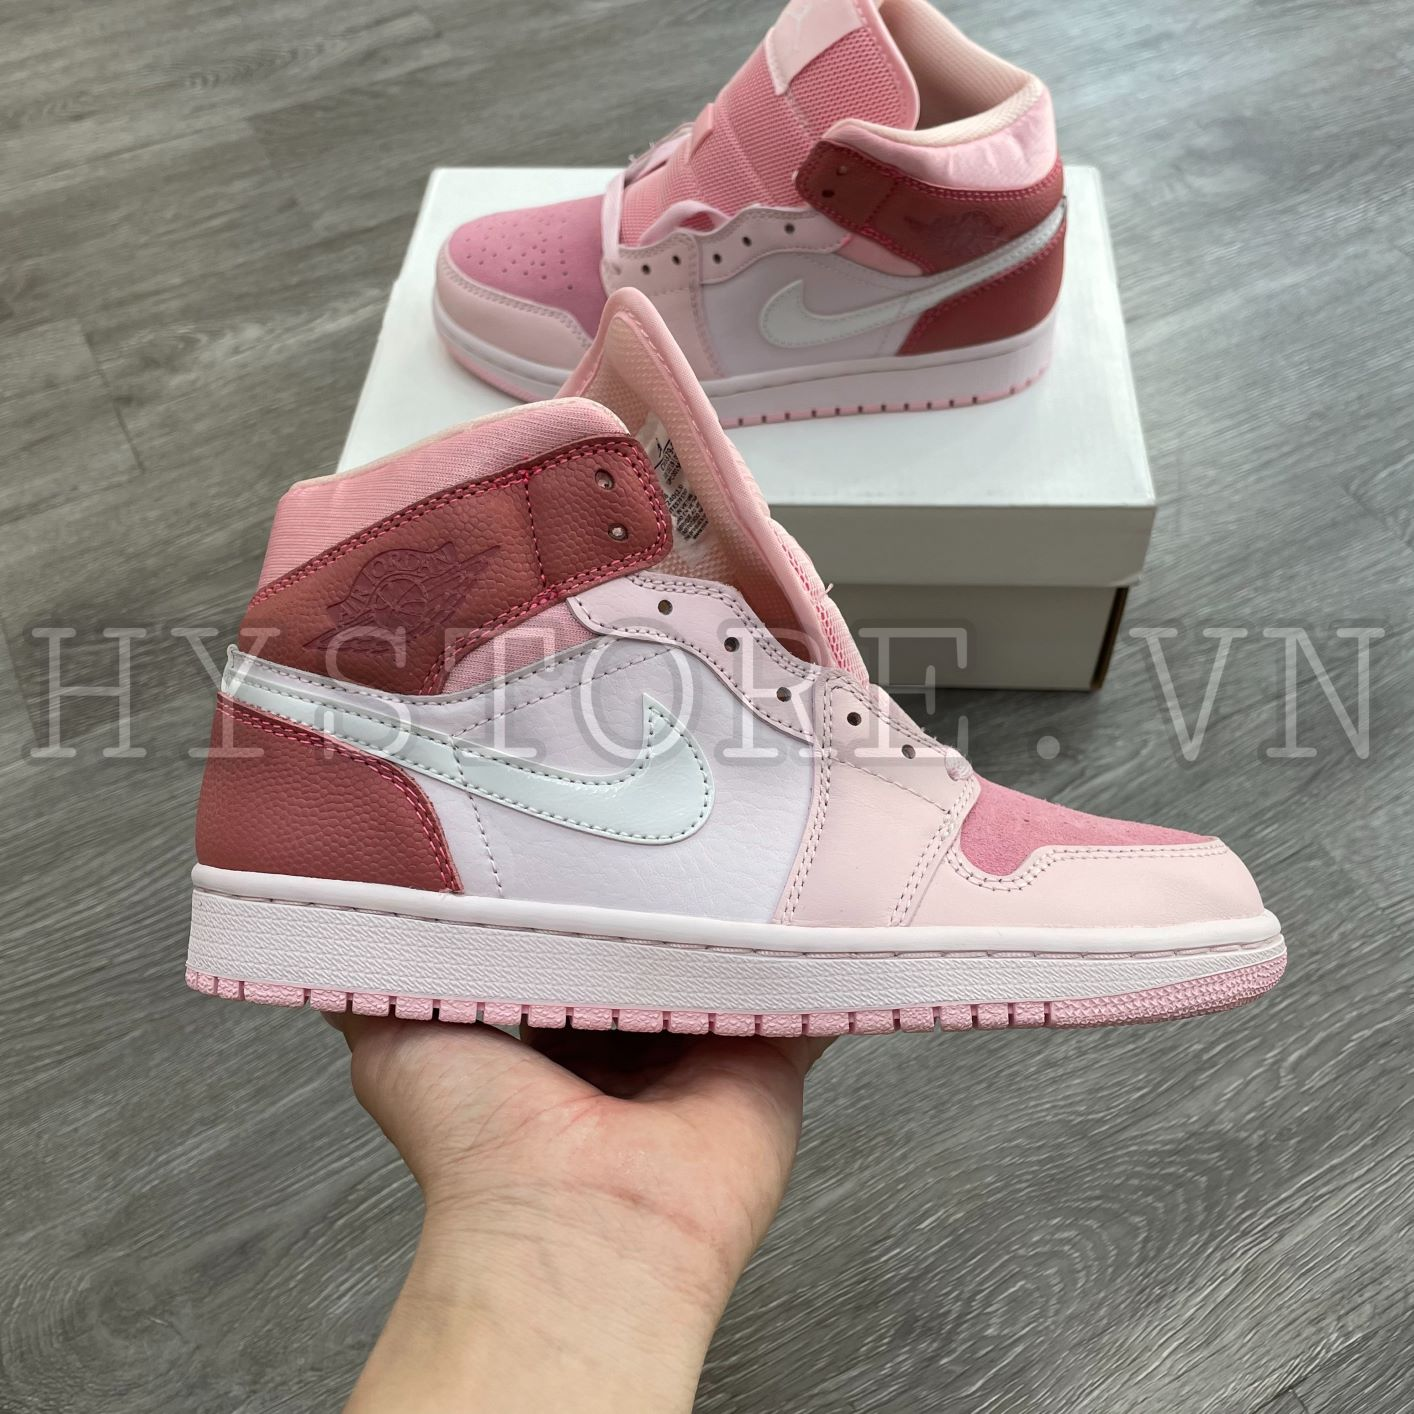 Giày Nike Jordan1 Mid digital pink